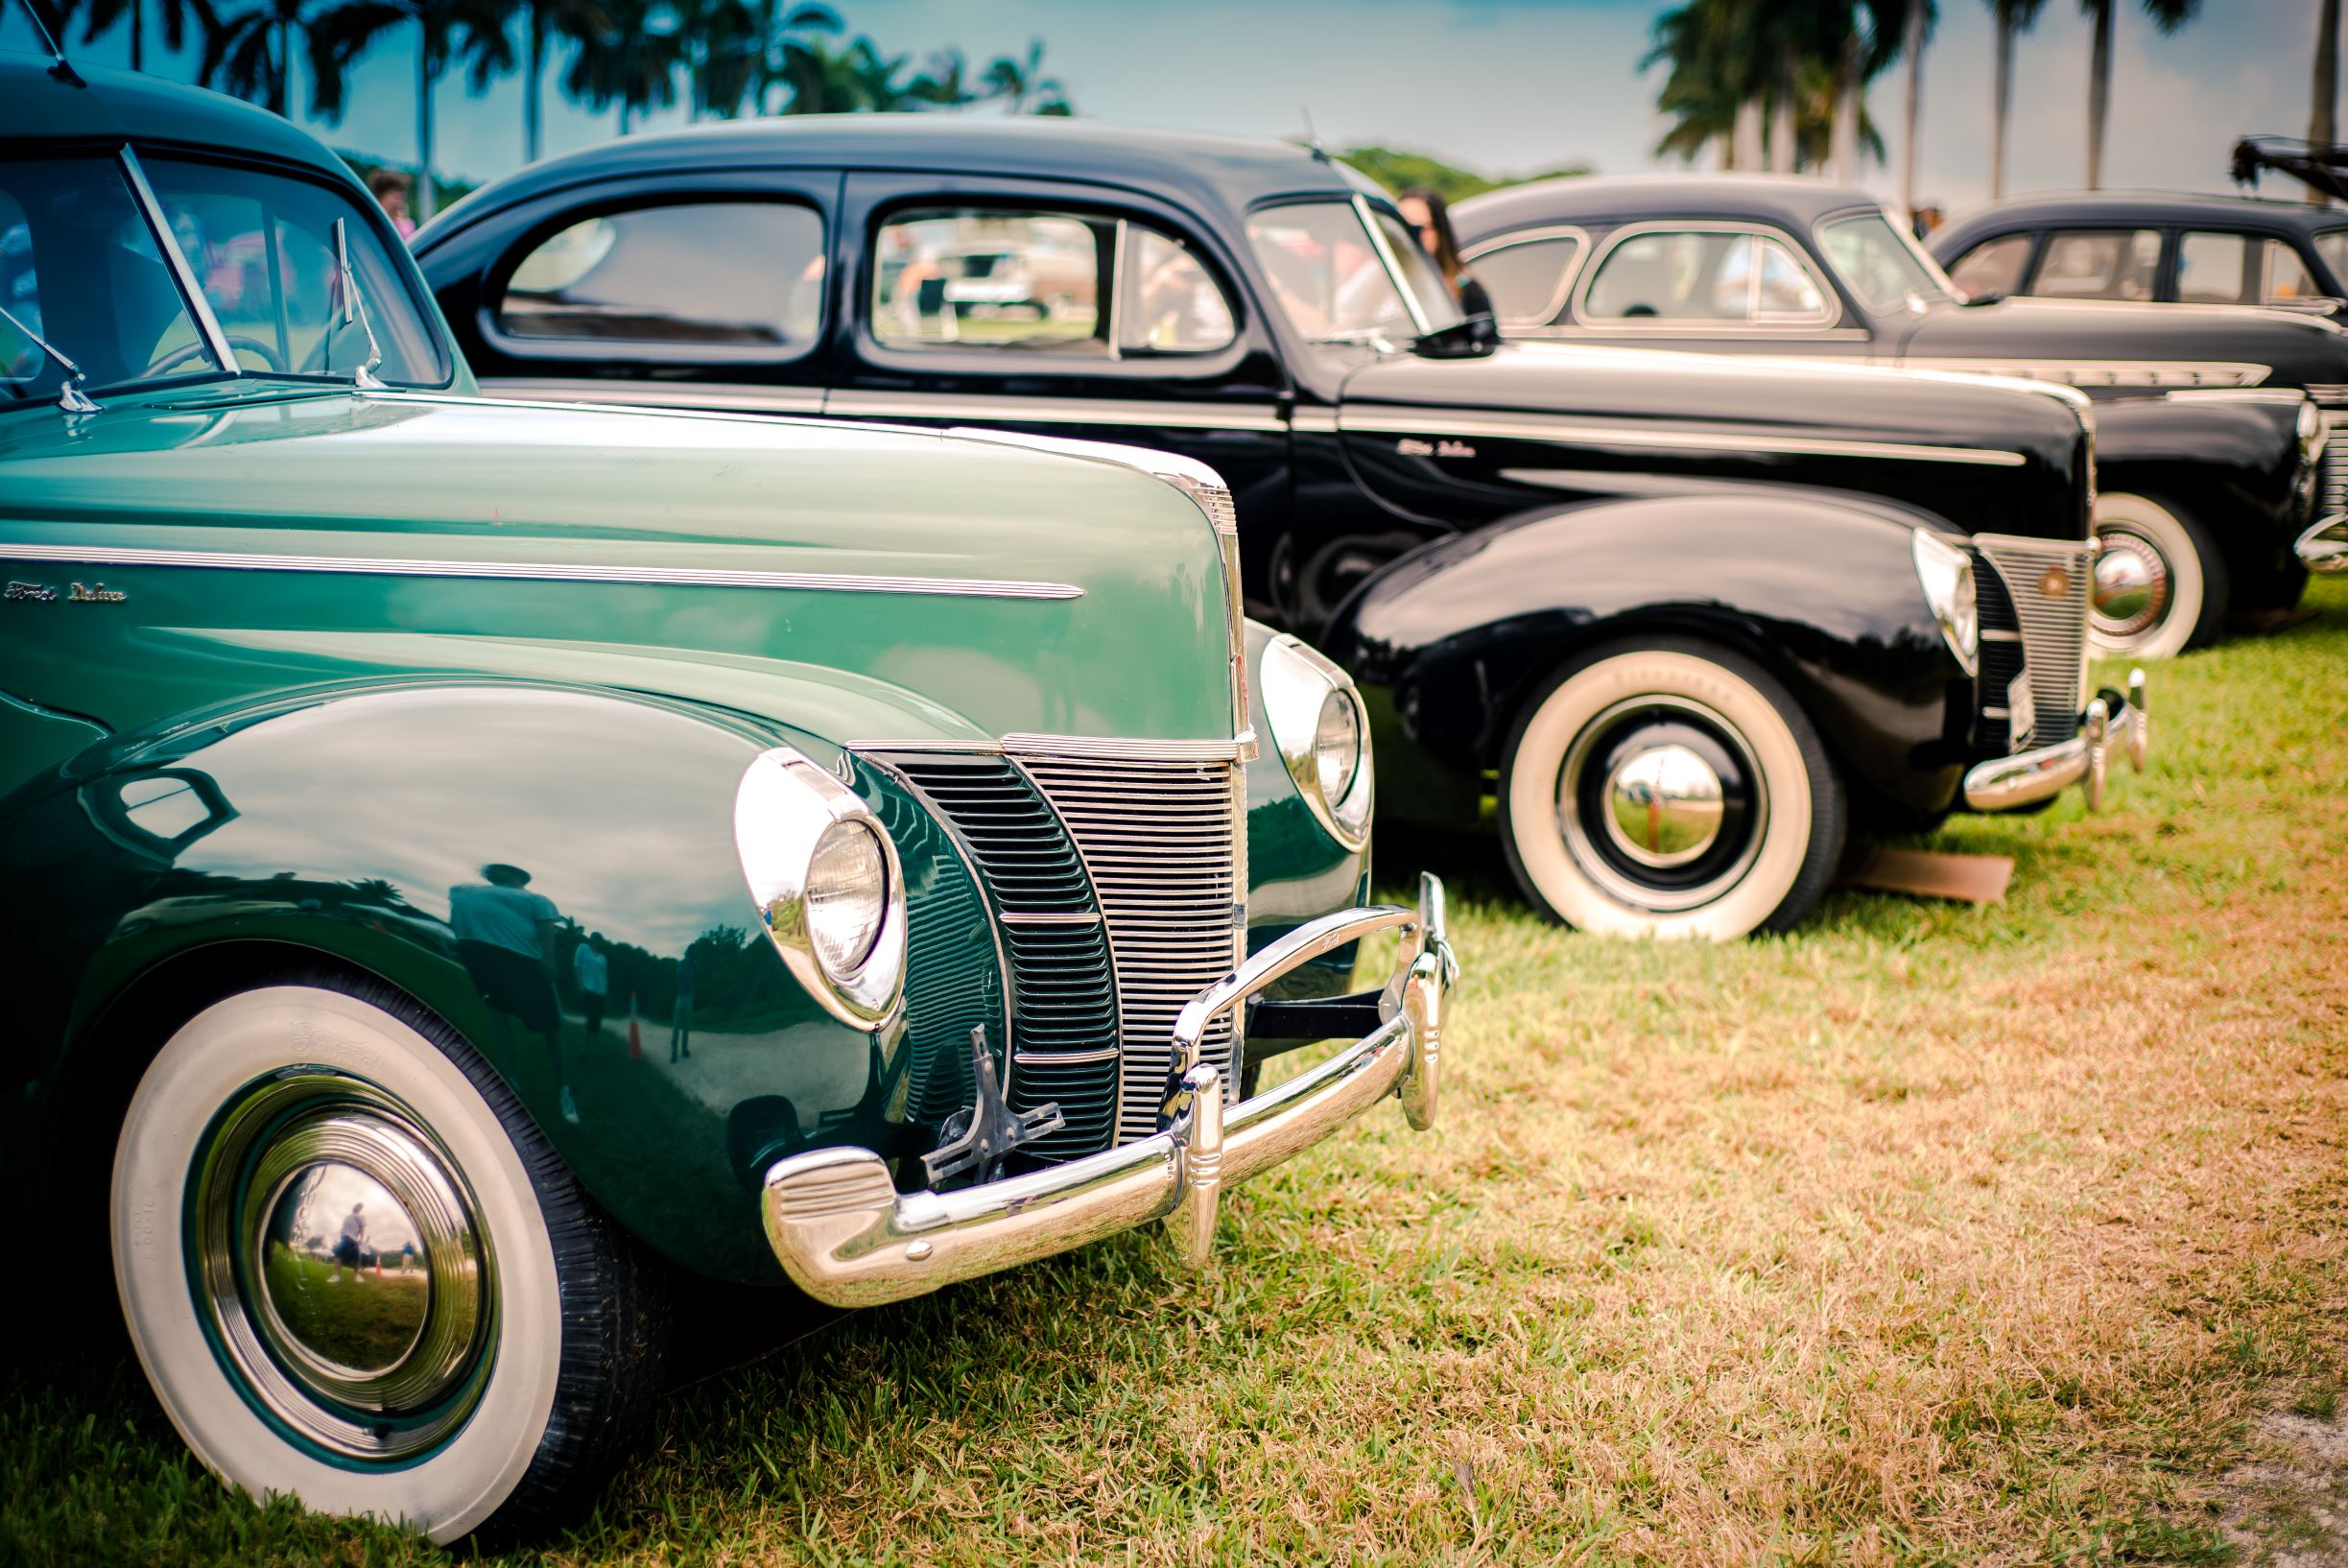 vintage auto show deering estate photo by Elias Horna